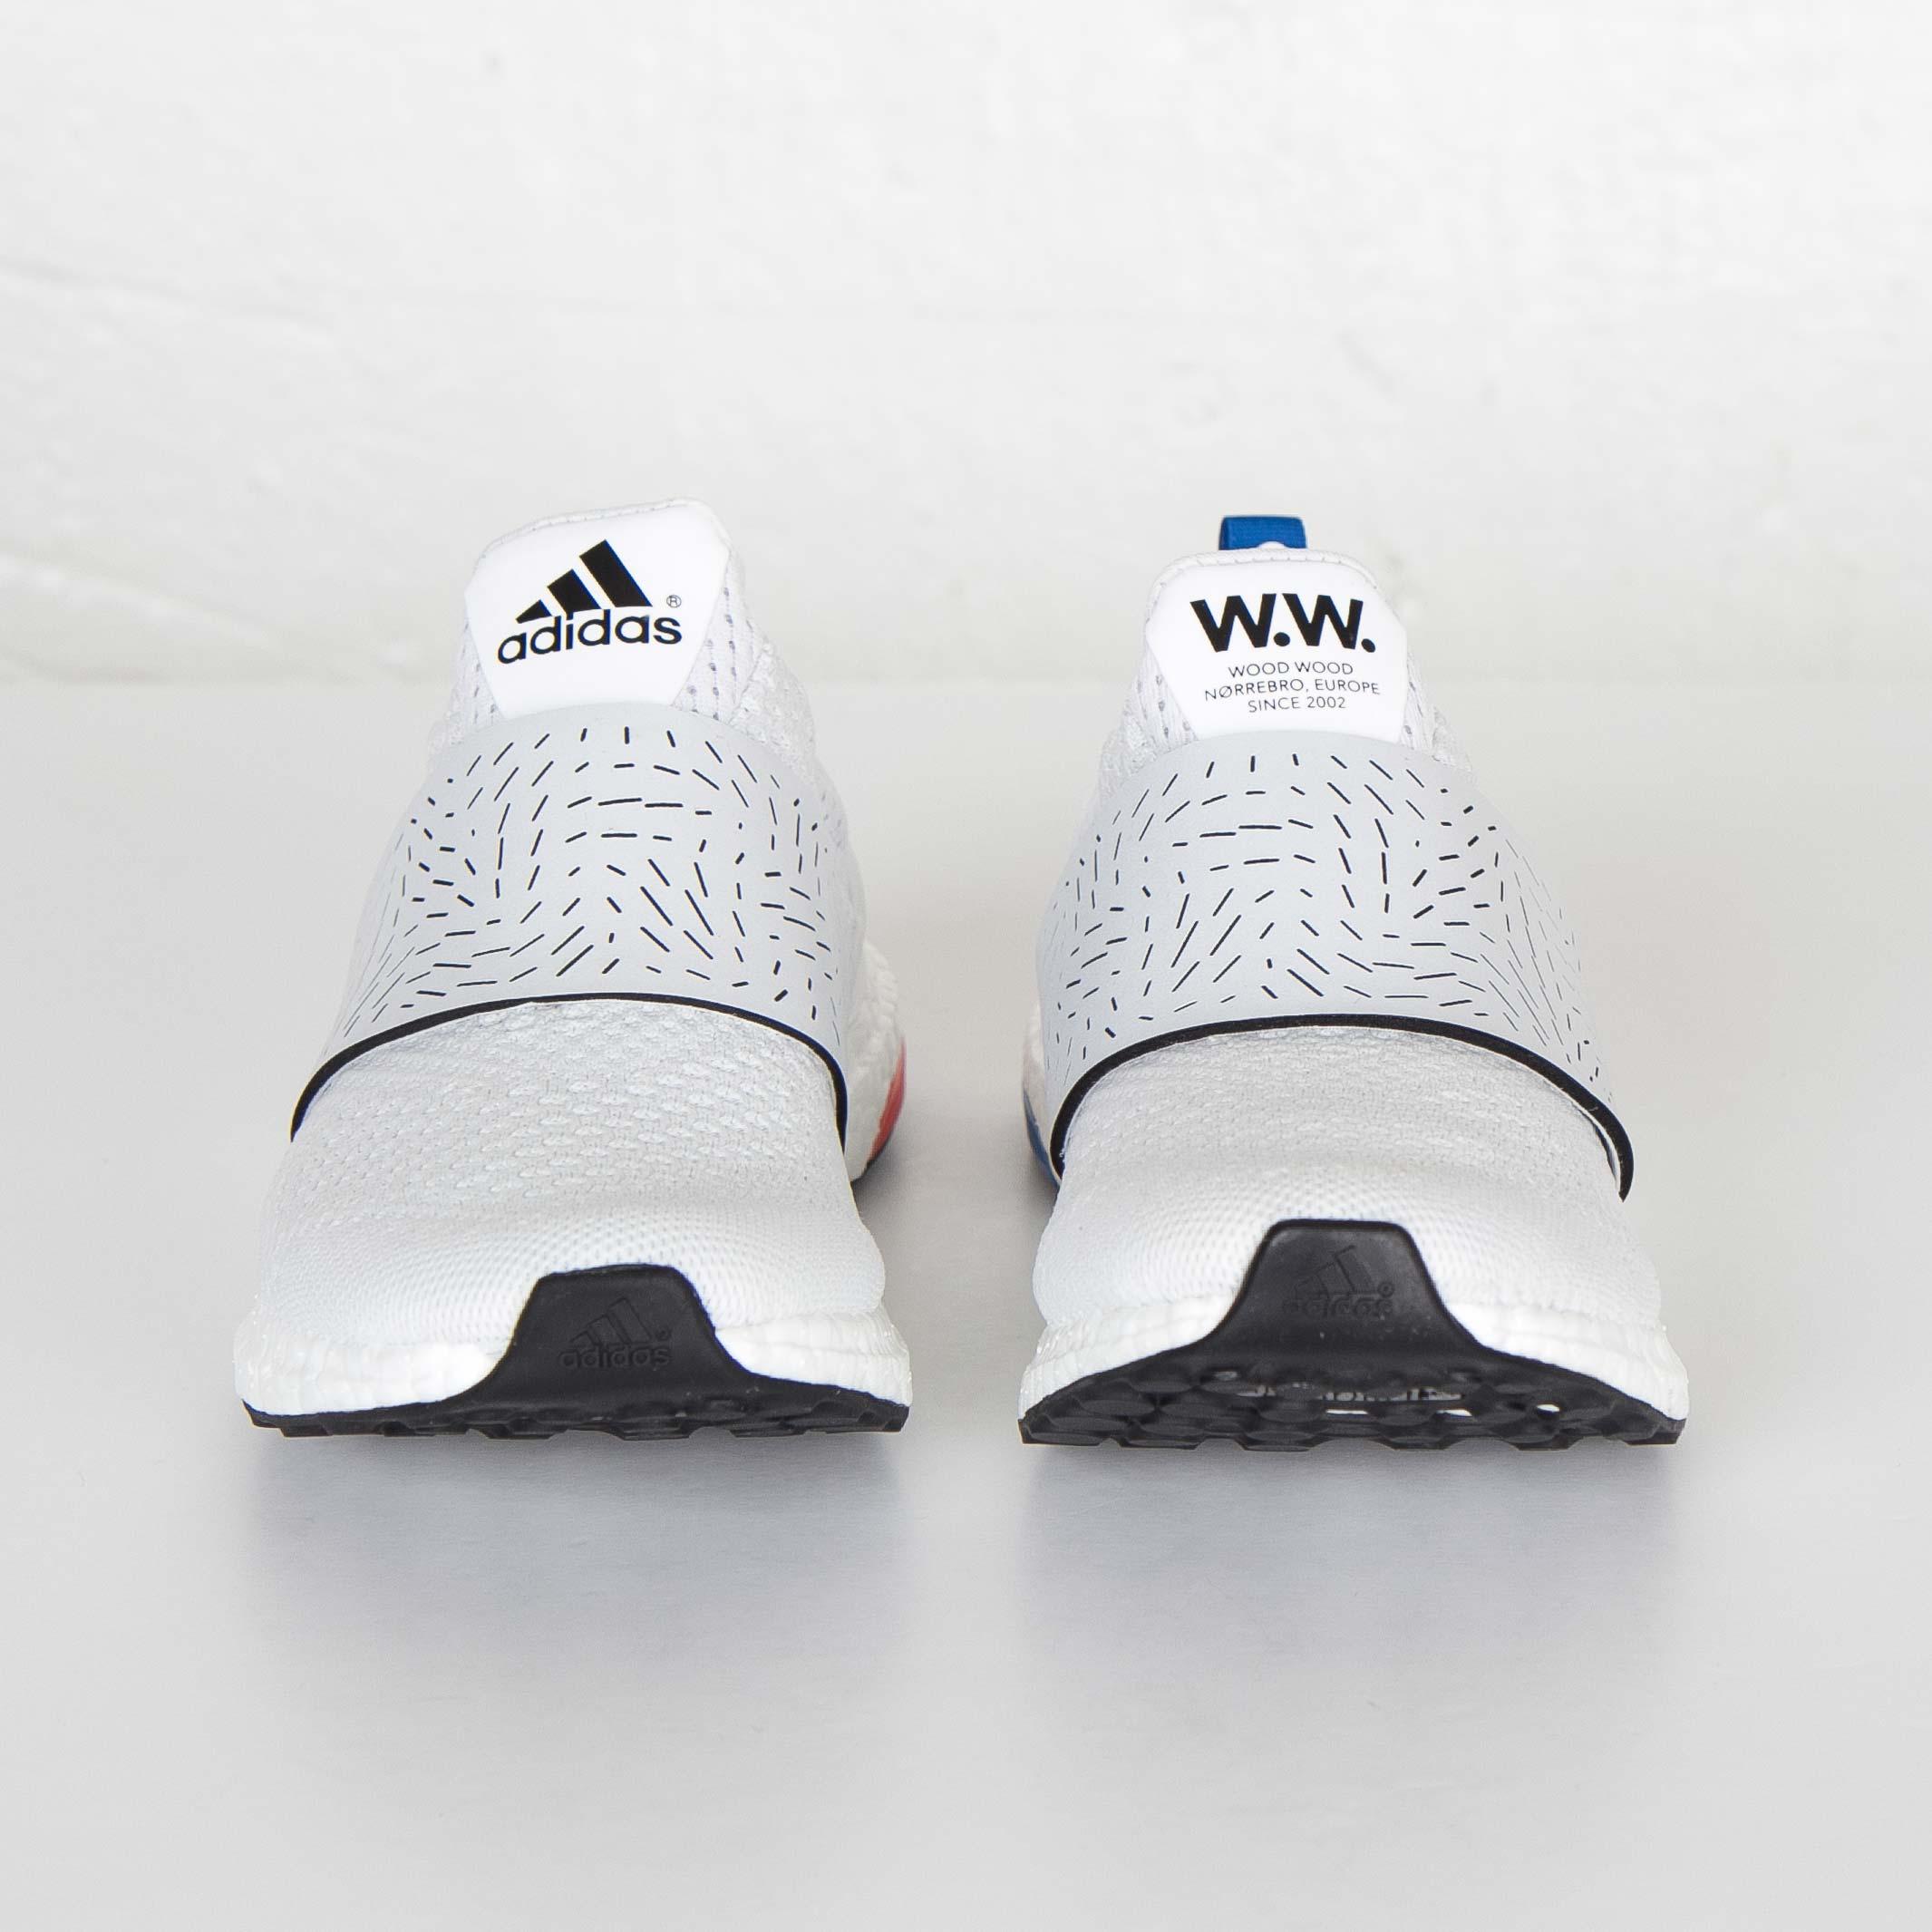 official photos 908bd 0976f adidas Ultraboost W - Af5779 - Sneakersnstuff   sneakers   streetwear  online since 1999